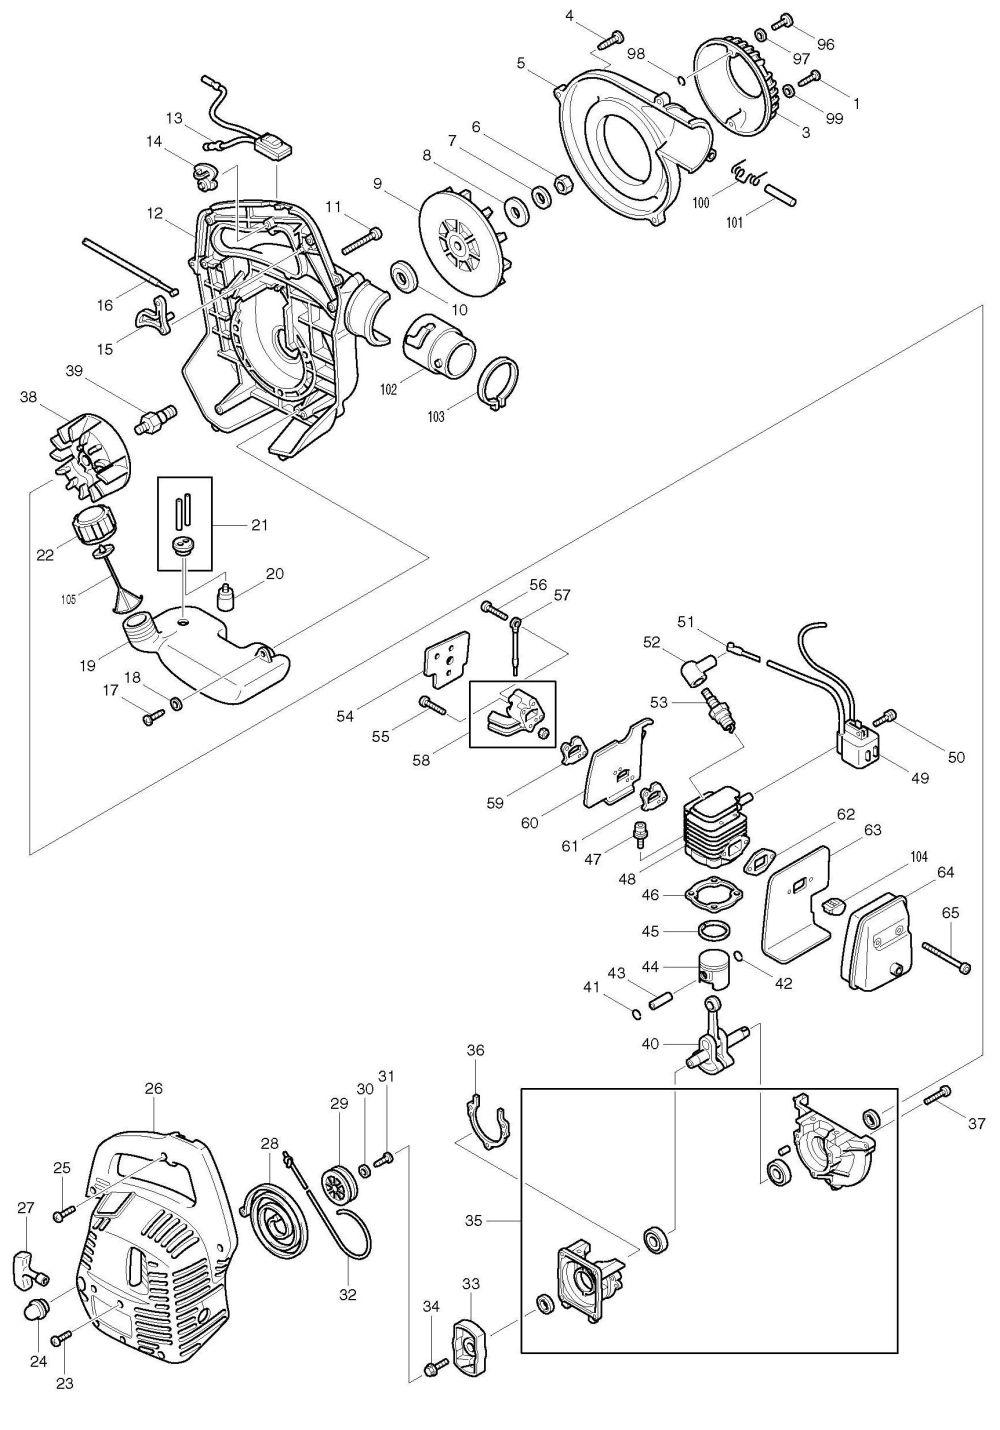 medium resolution of makita blower wiring diagram wiring diagram detailed emerson blower motor wiring diagram makita blower wiring diagram